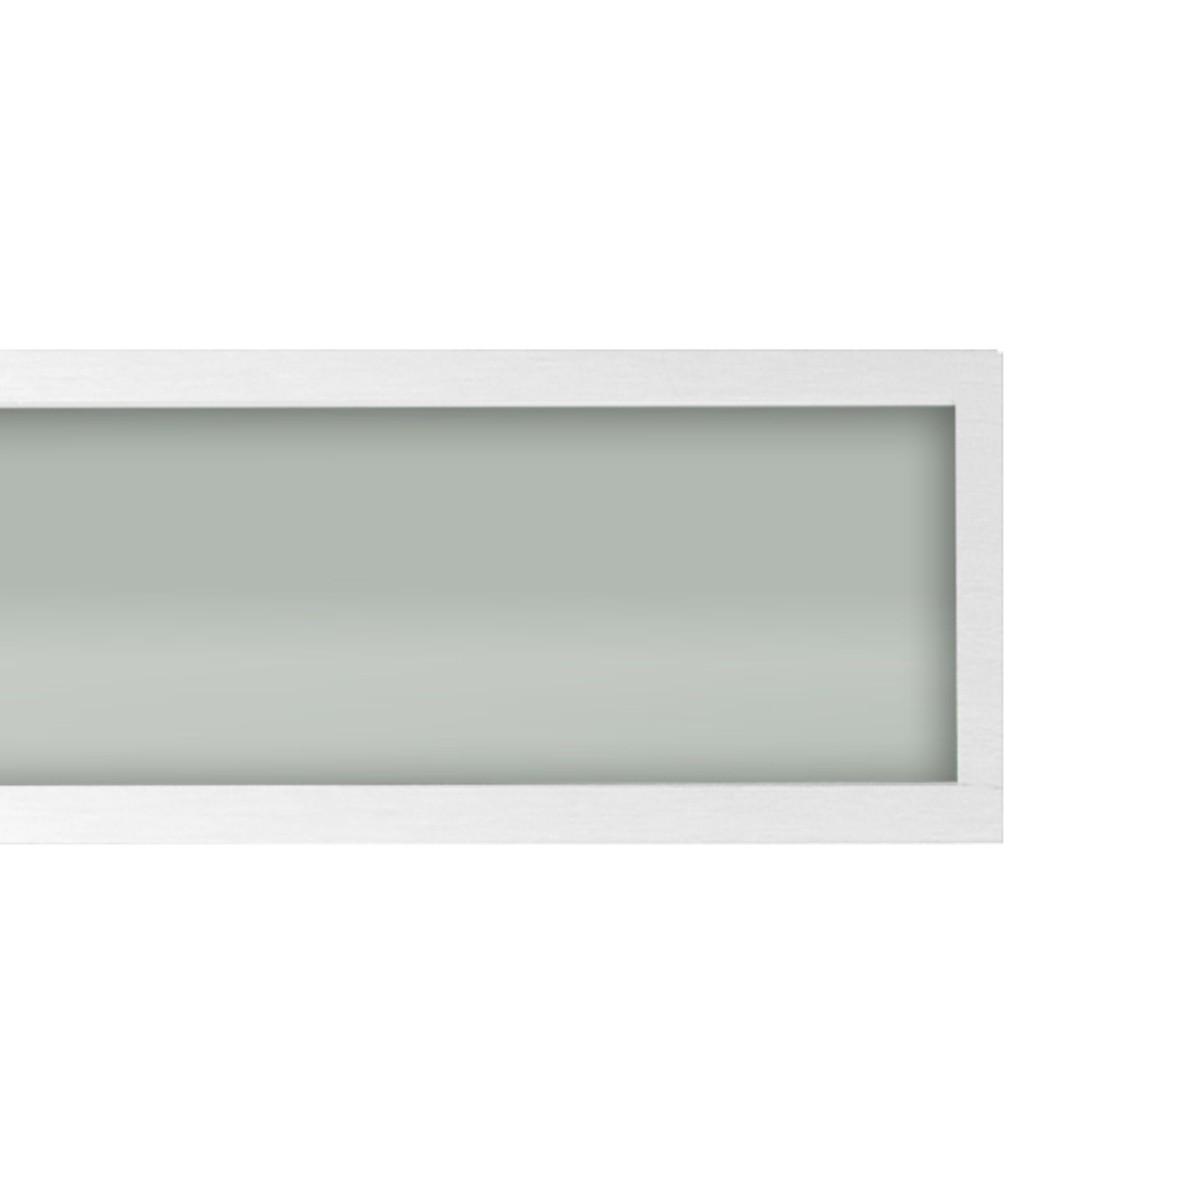 Plafon Space Sobr. Ret. 135cm Alum. Vidro Fosco 2x40w Fluor. Branco 05 Unidades